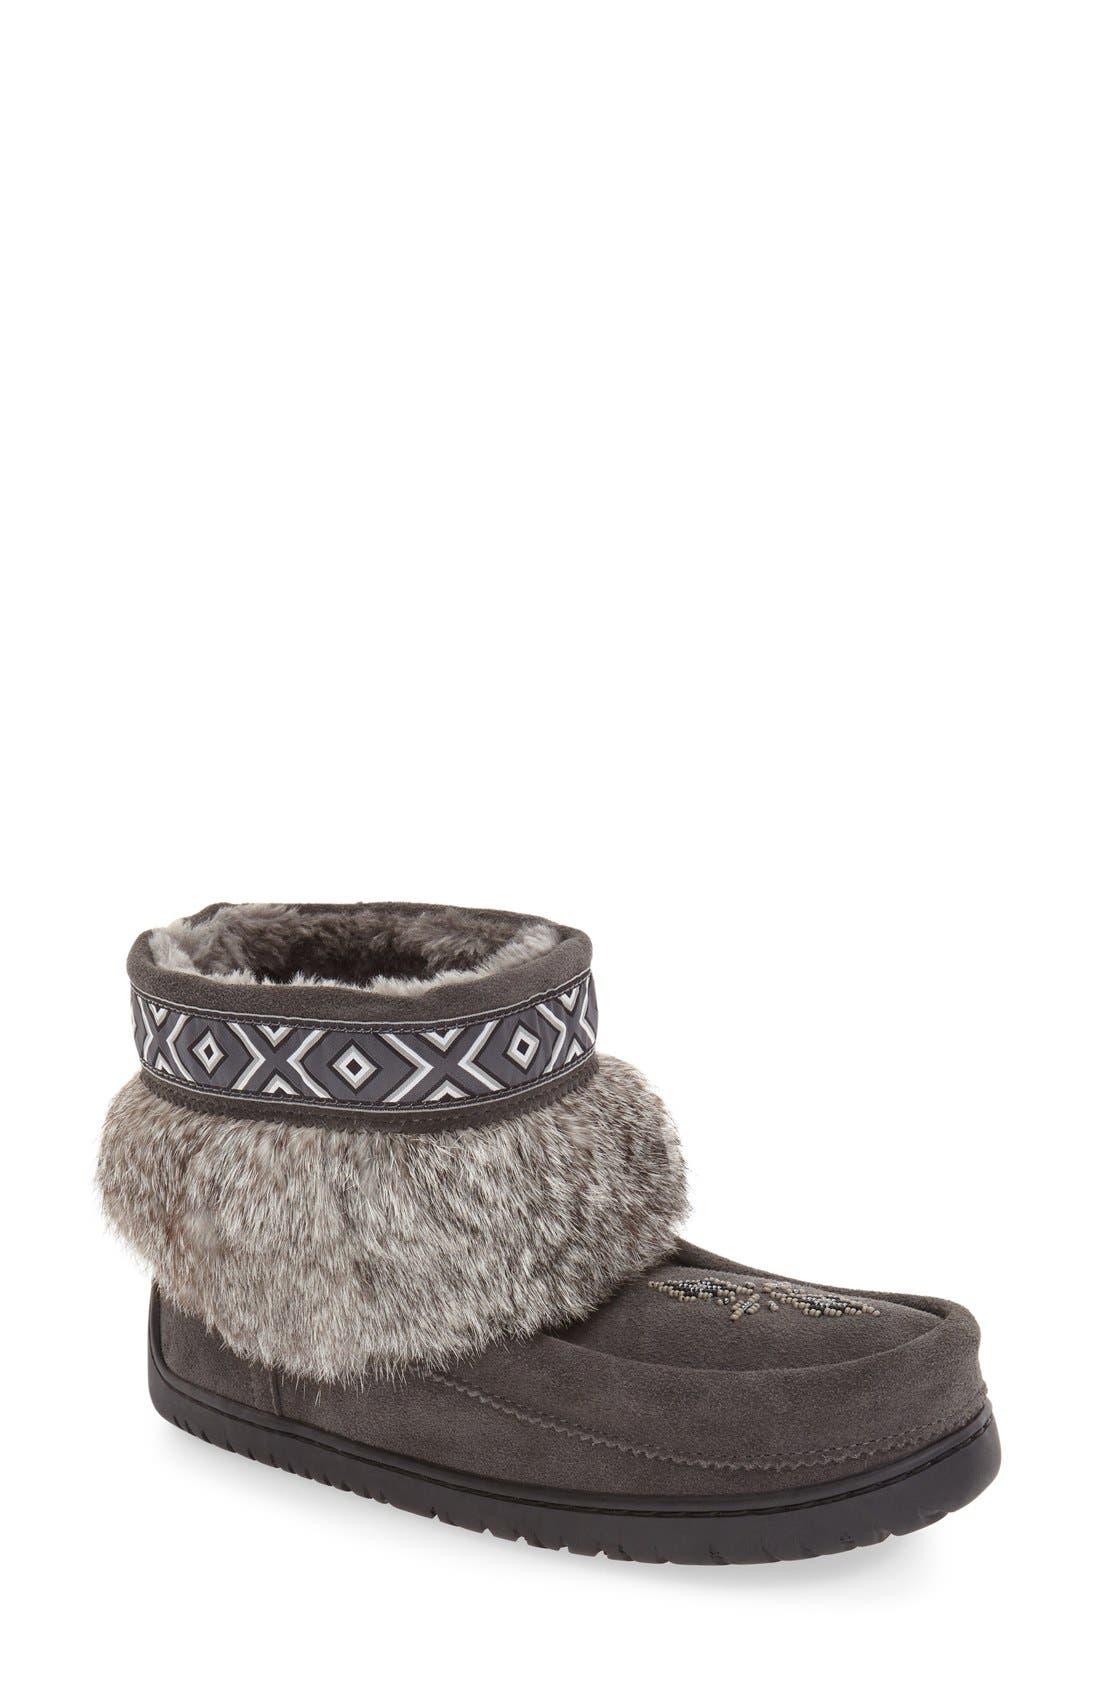 Main Image - Manitobah Mukluks 'Keewatin' Genuine Shearling and Rabbit Fur Boot (Women)